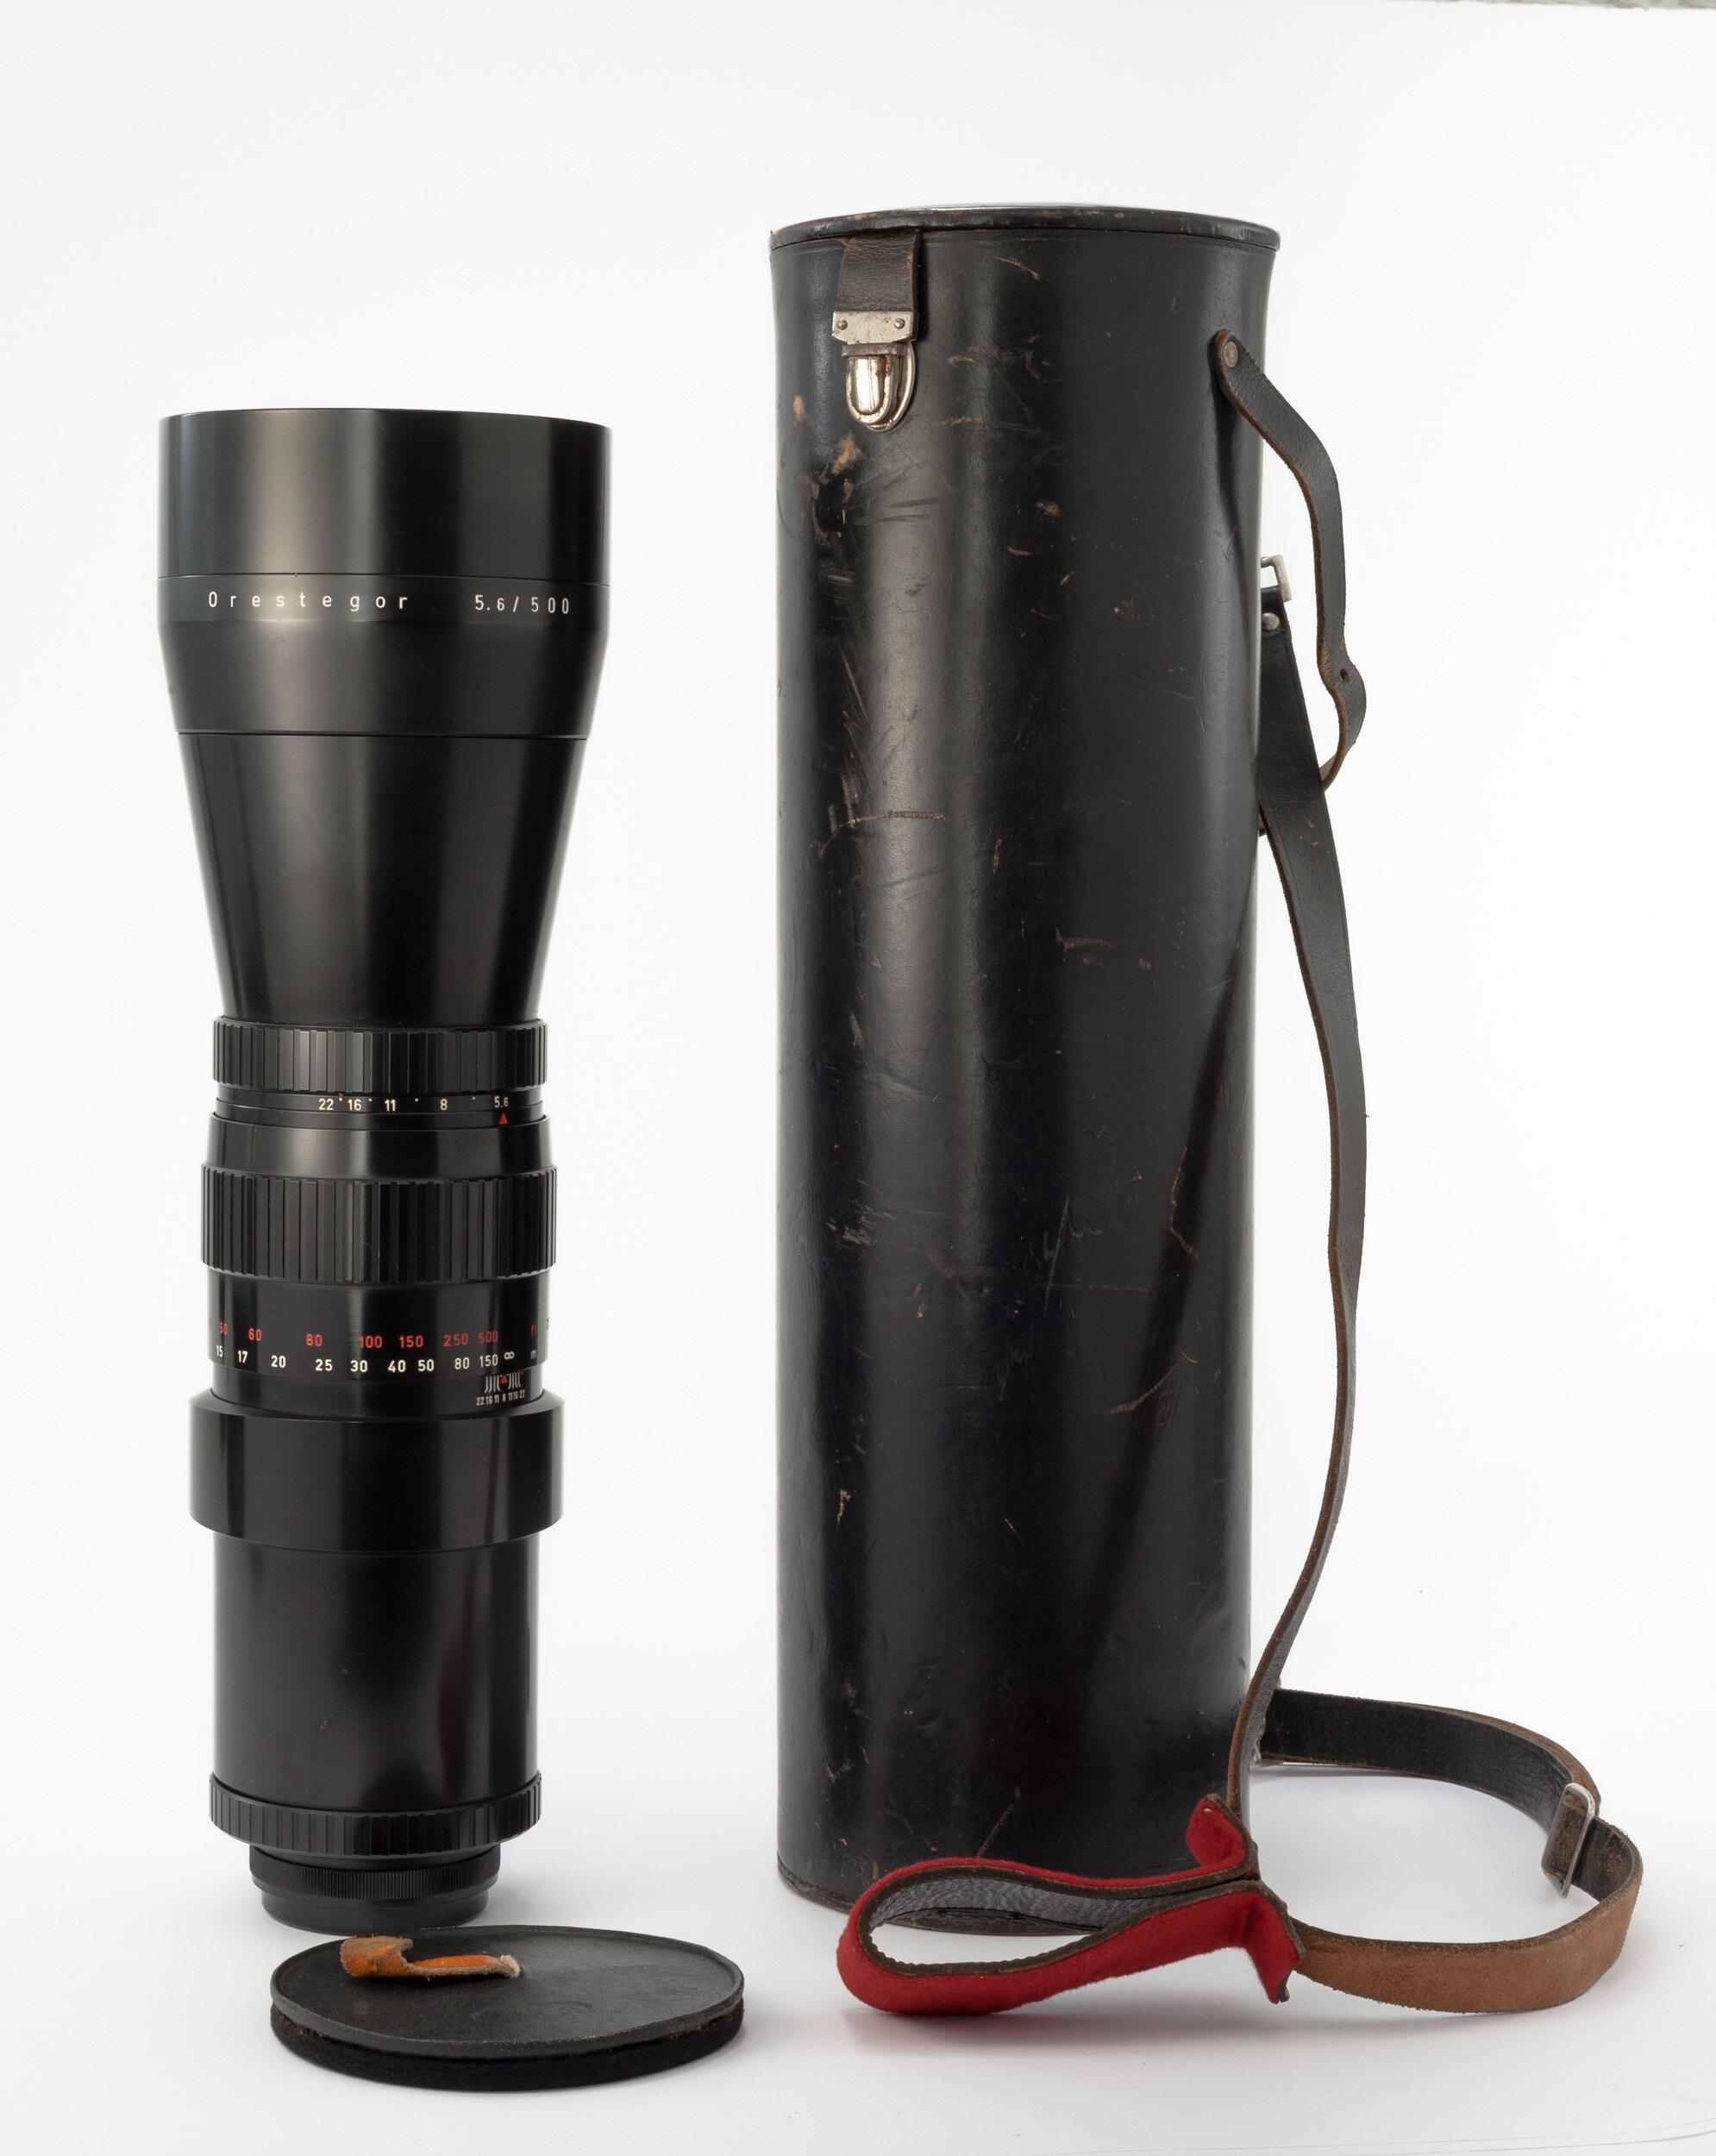 Meyer f. Pent.-six 5,6/500mm Orestegor